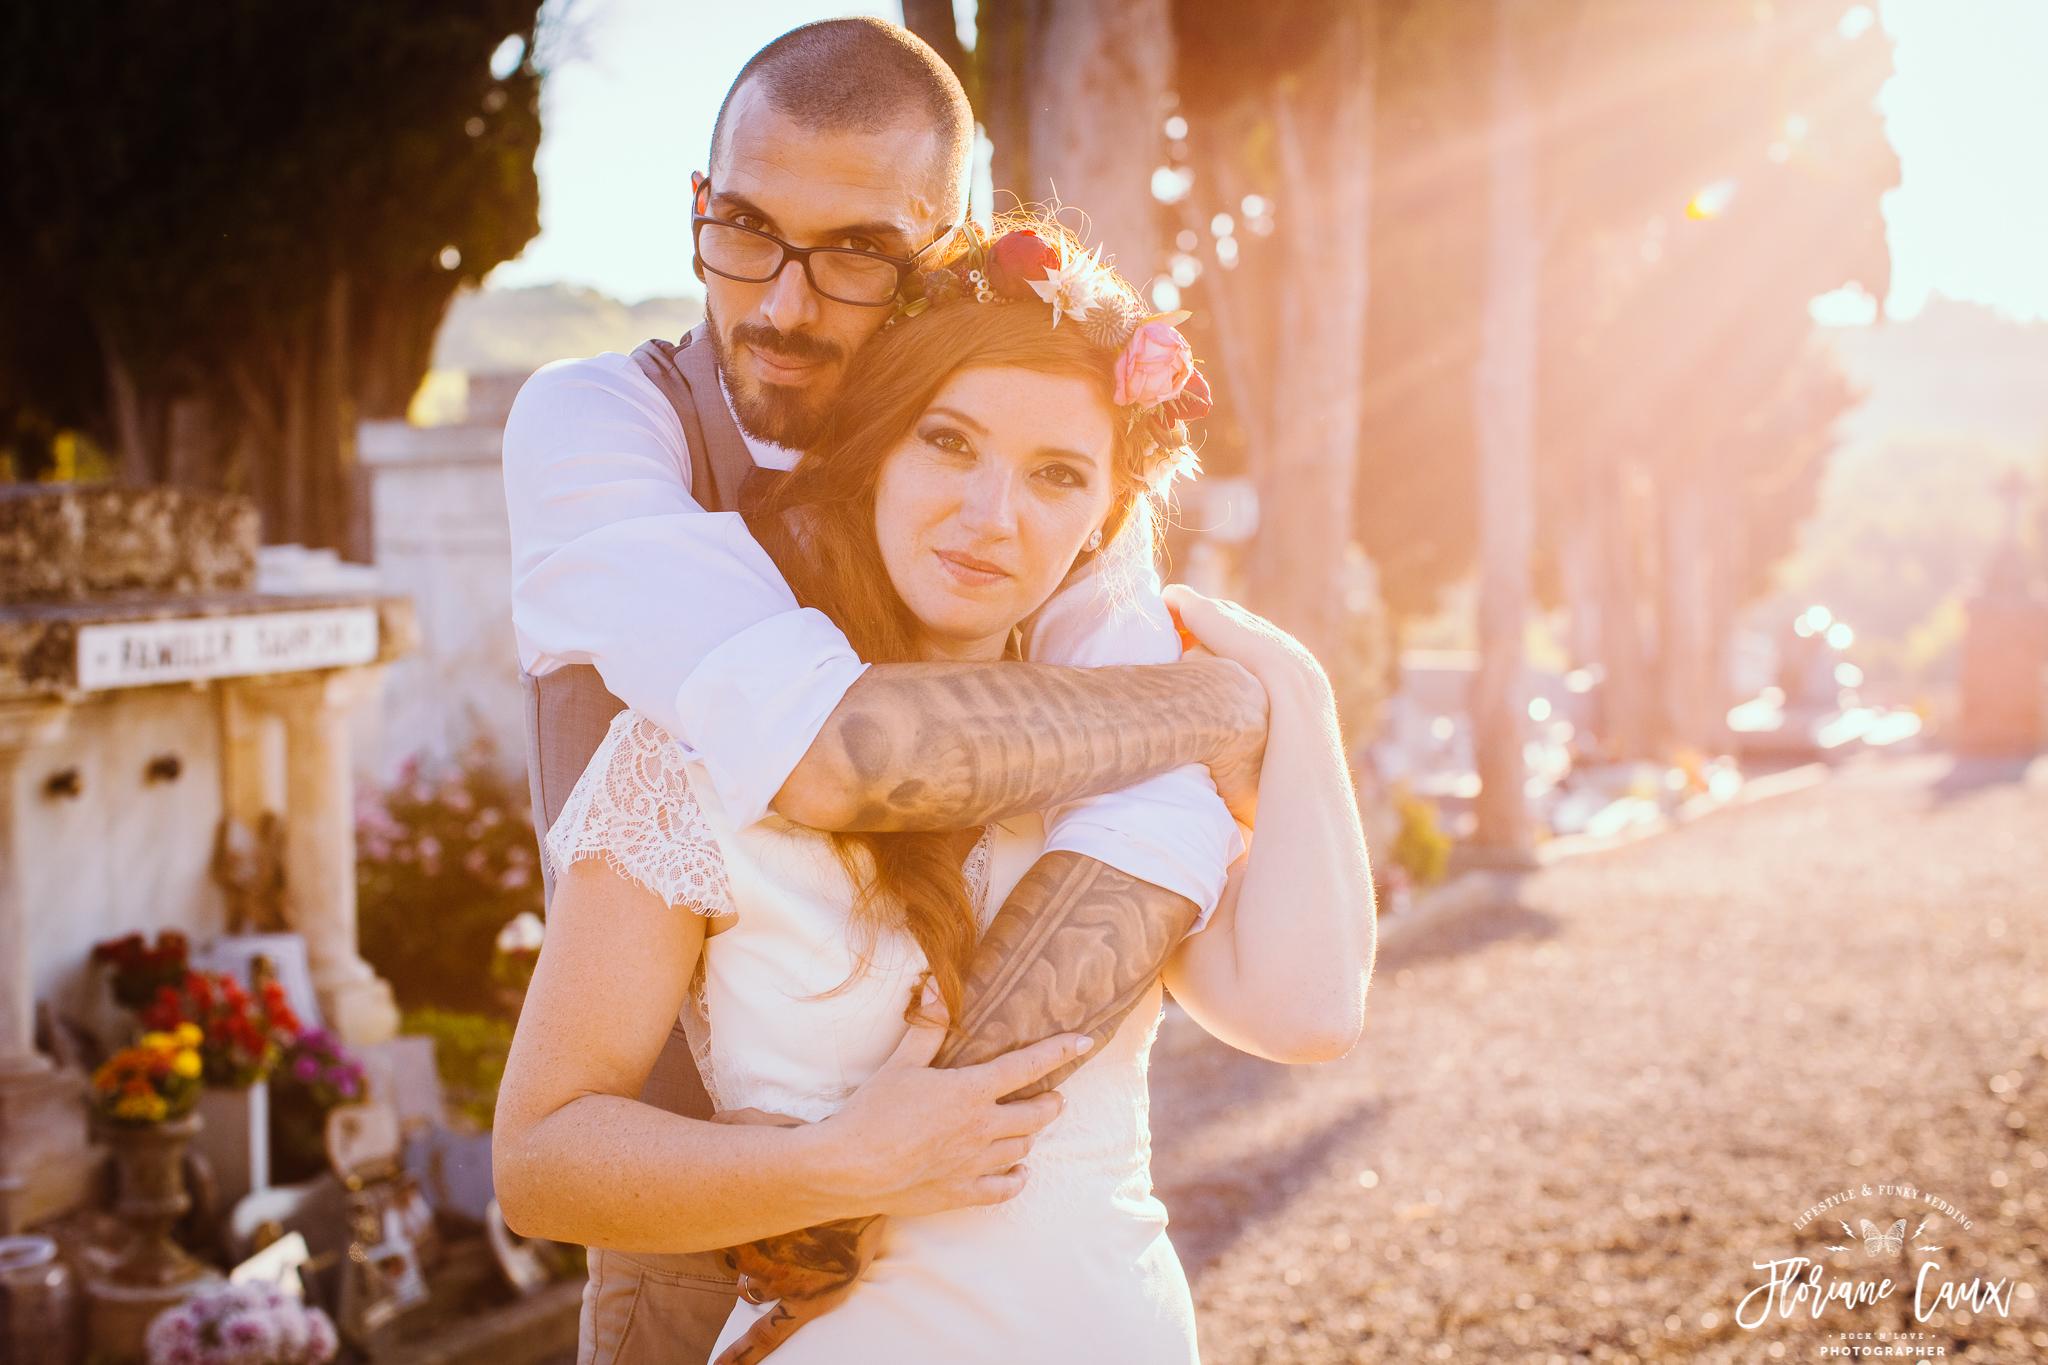 photographe-mariage-toulouse-rocknroll-maries-tatoues-floriane-caux-58